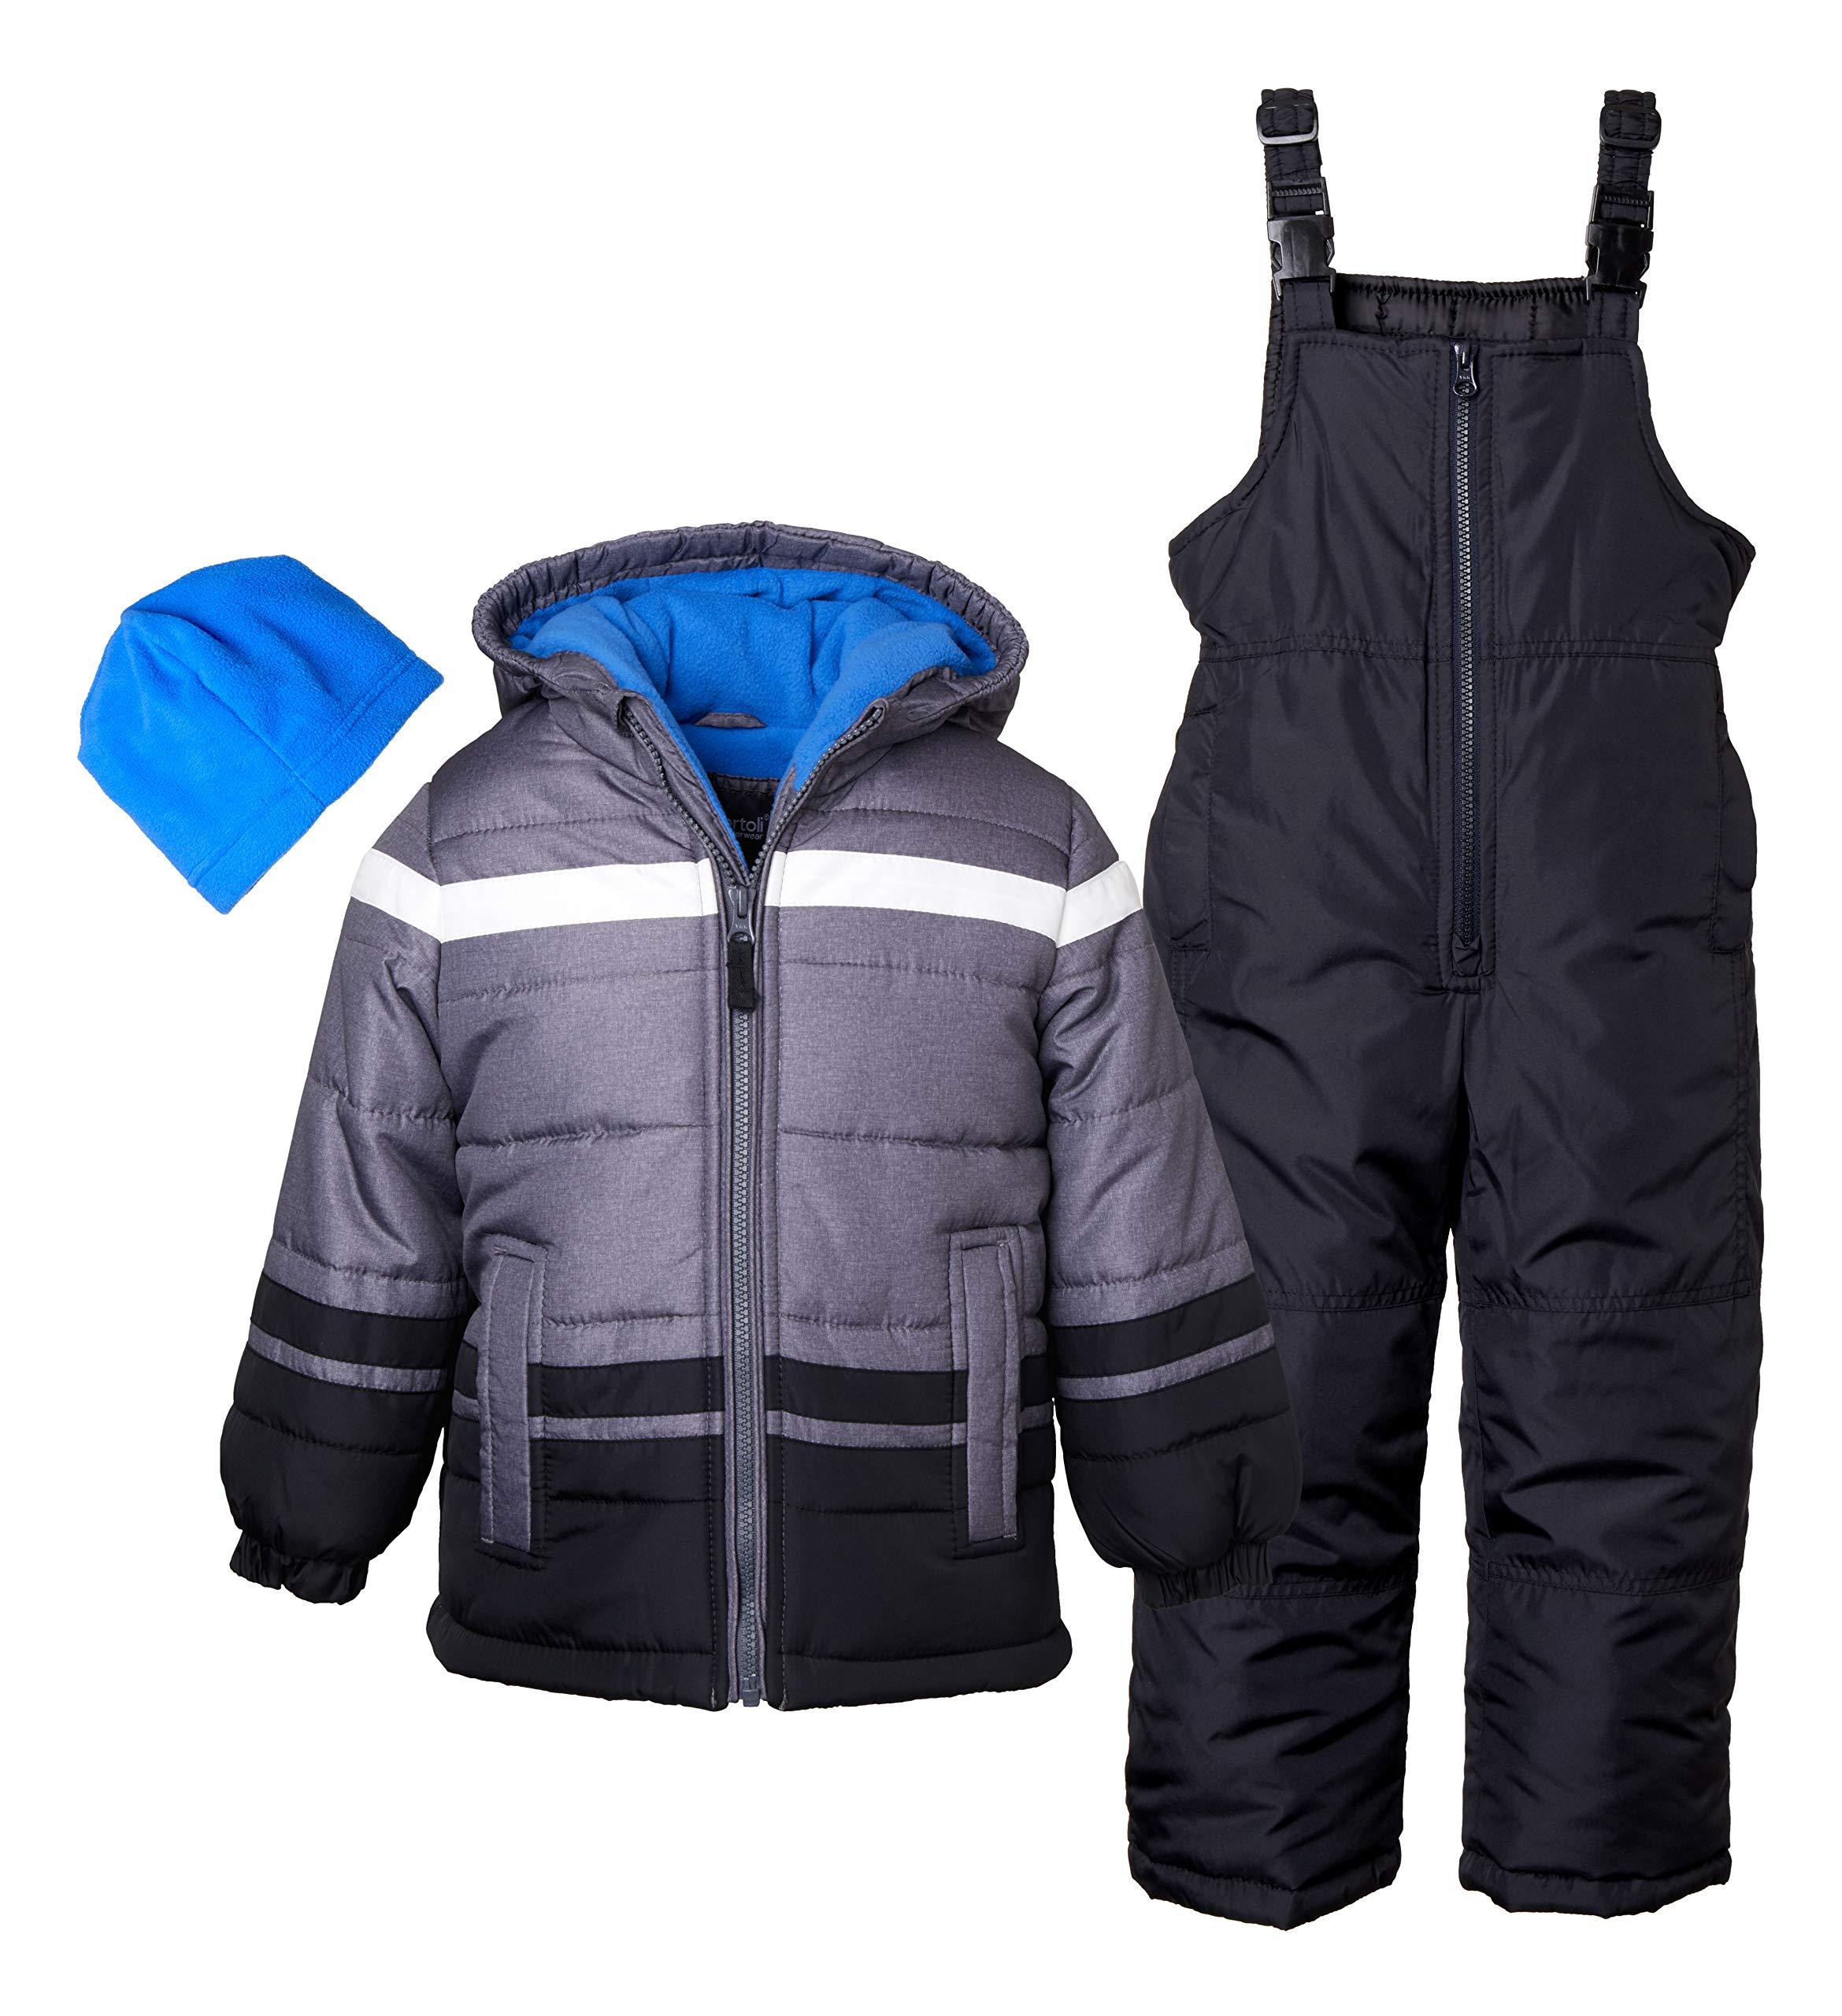 Sportoli Boys' Kids Winter Snowboard Skiing Parka Jacket & Snow Bib Snowsuit Set - Black/Royal (Size 3T)